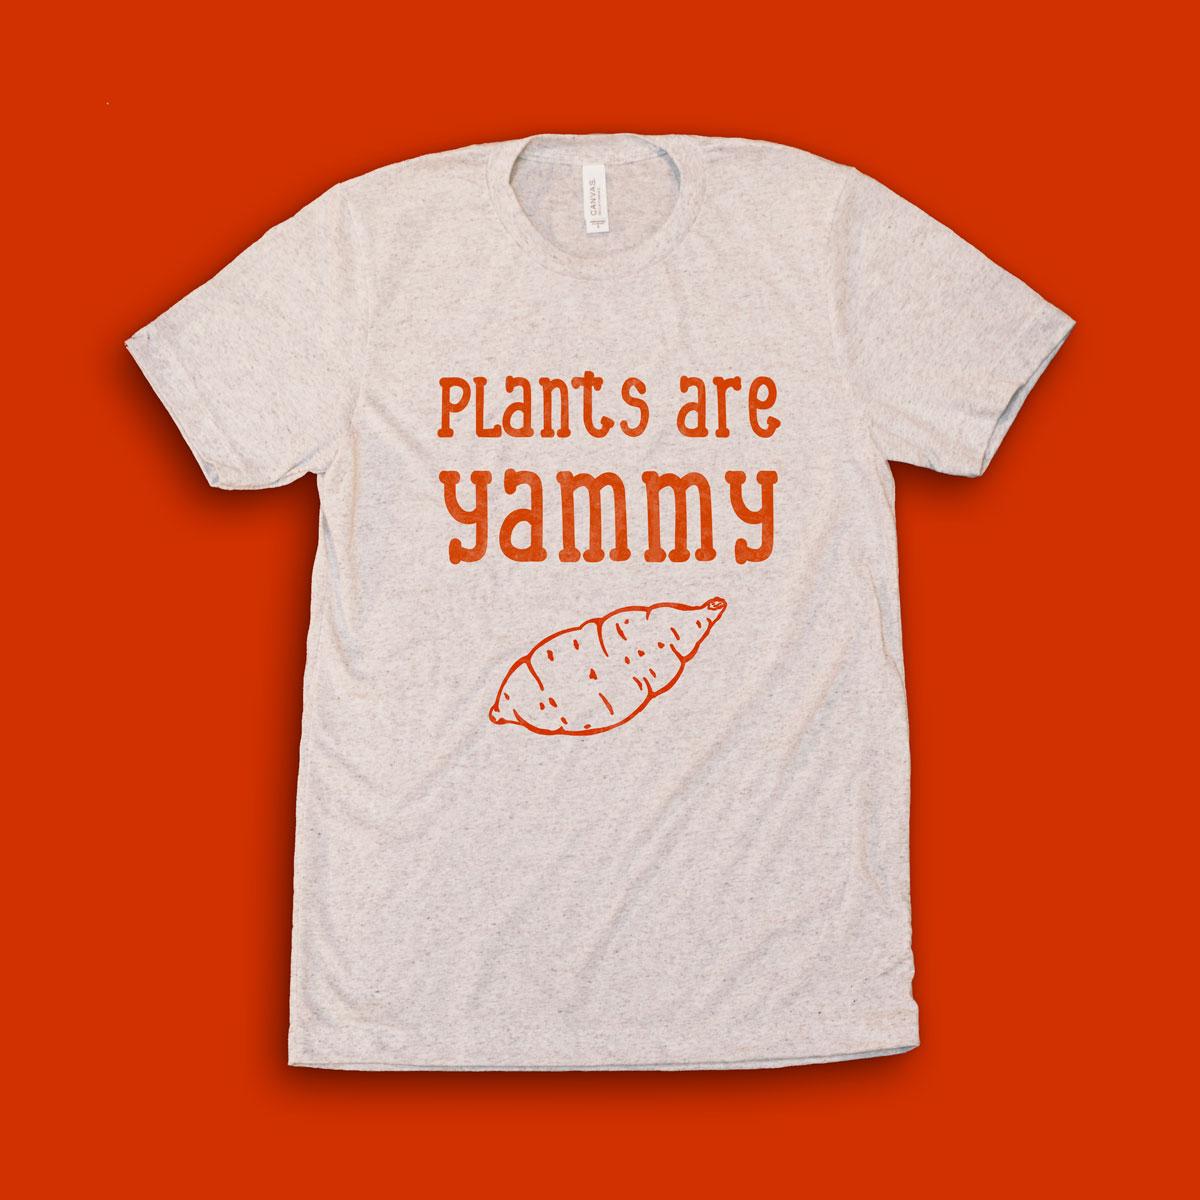 Planty-Good_Vegan-Clothing_Plants-Are-Yammy_Tee_front.jpg